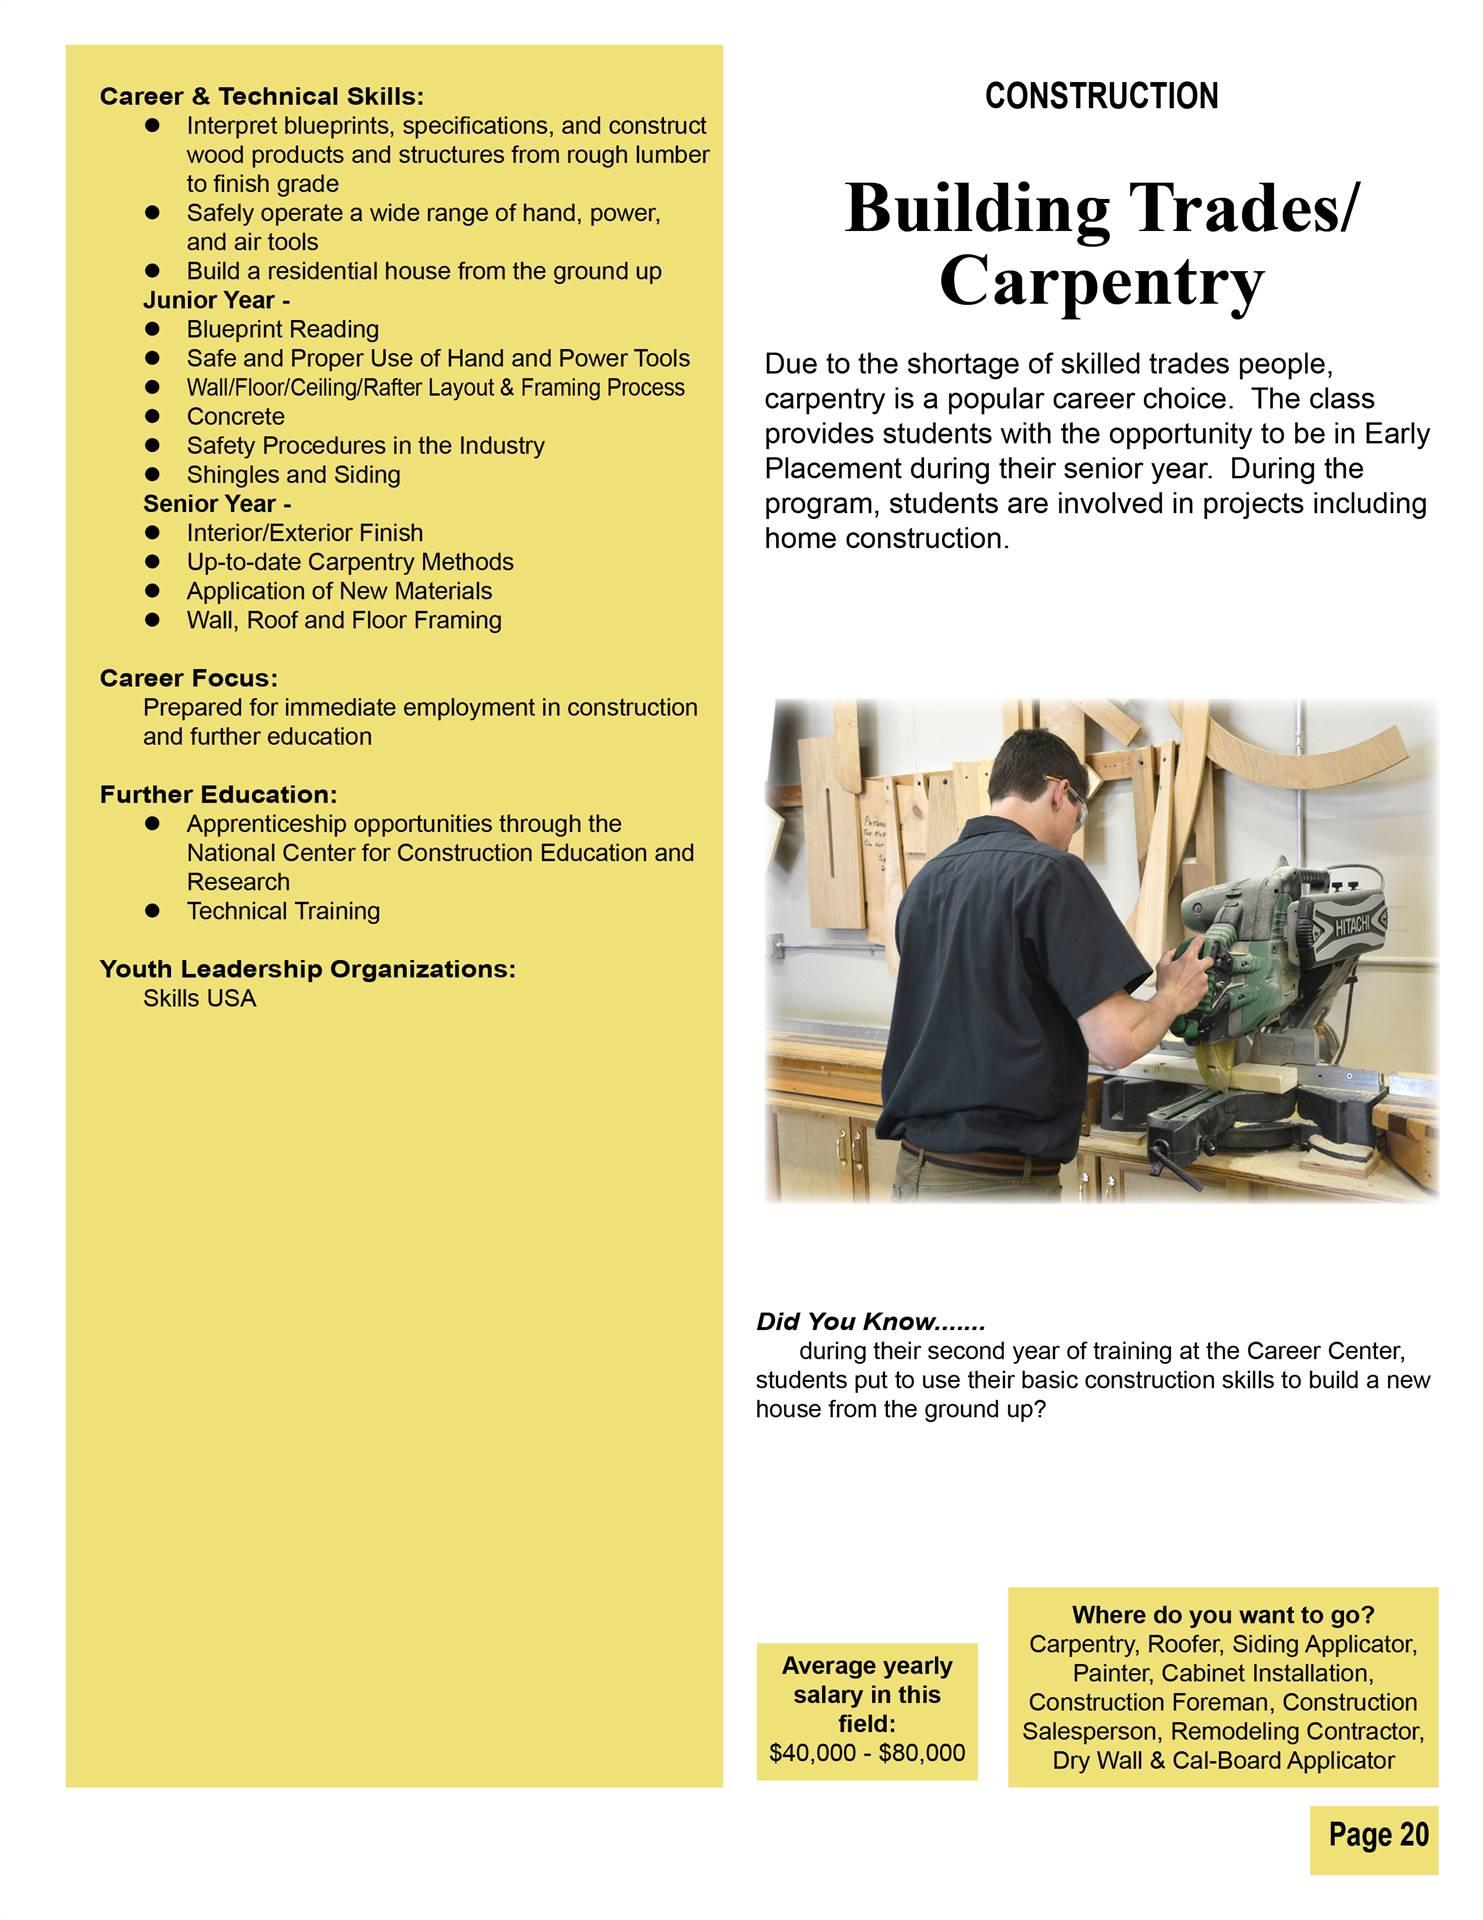 Building Trades/Carpentry